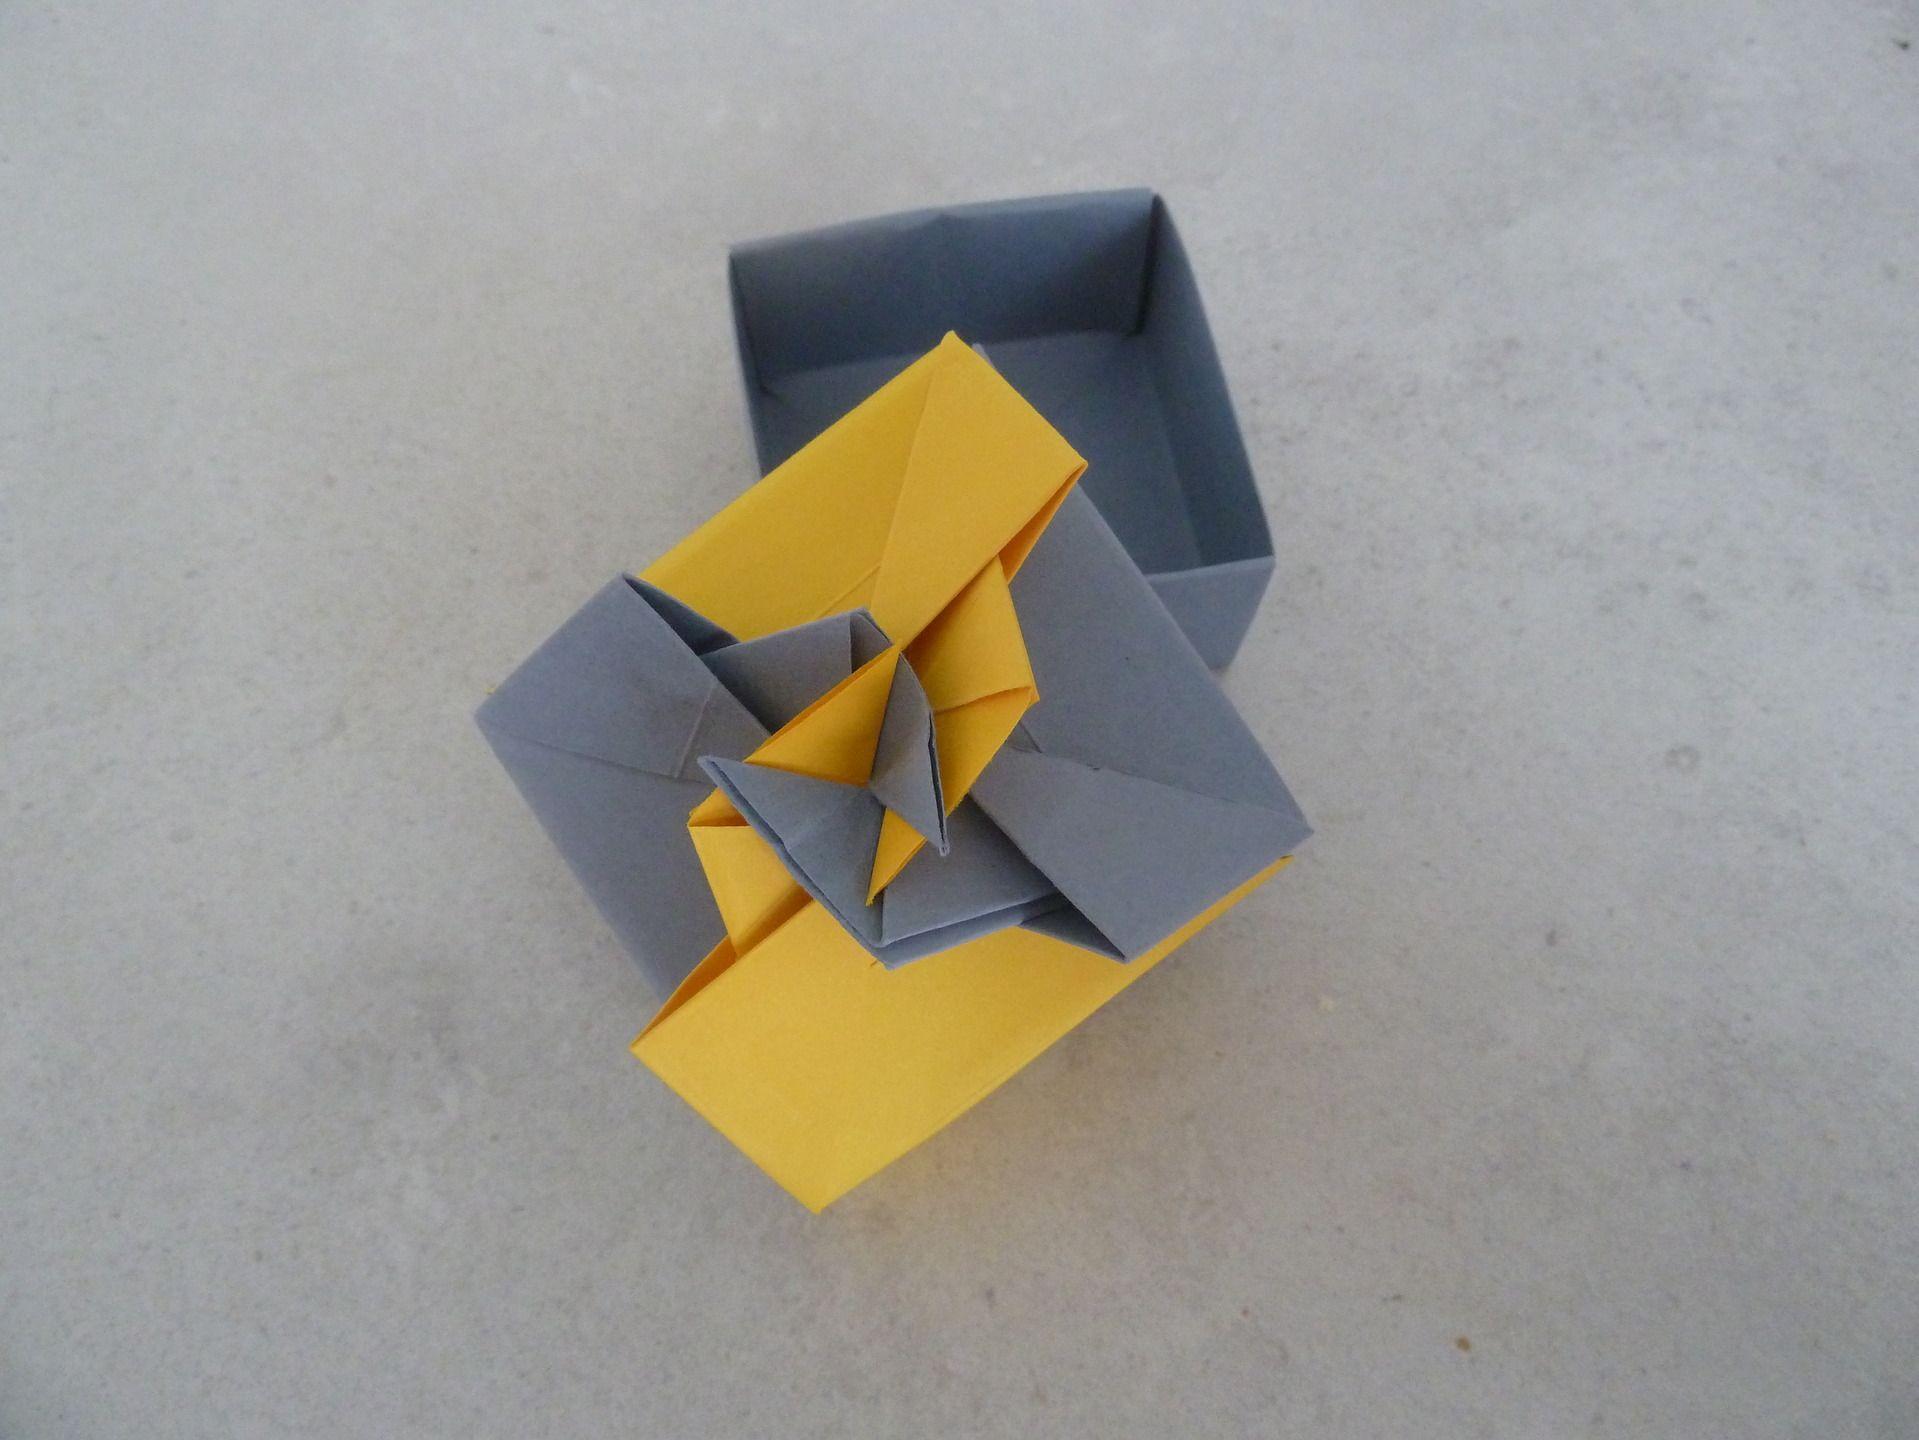 cadeau anniversaire origami